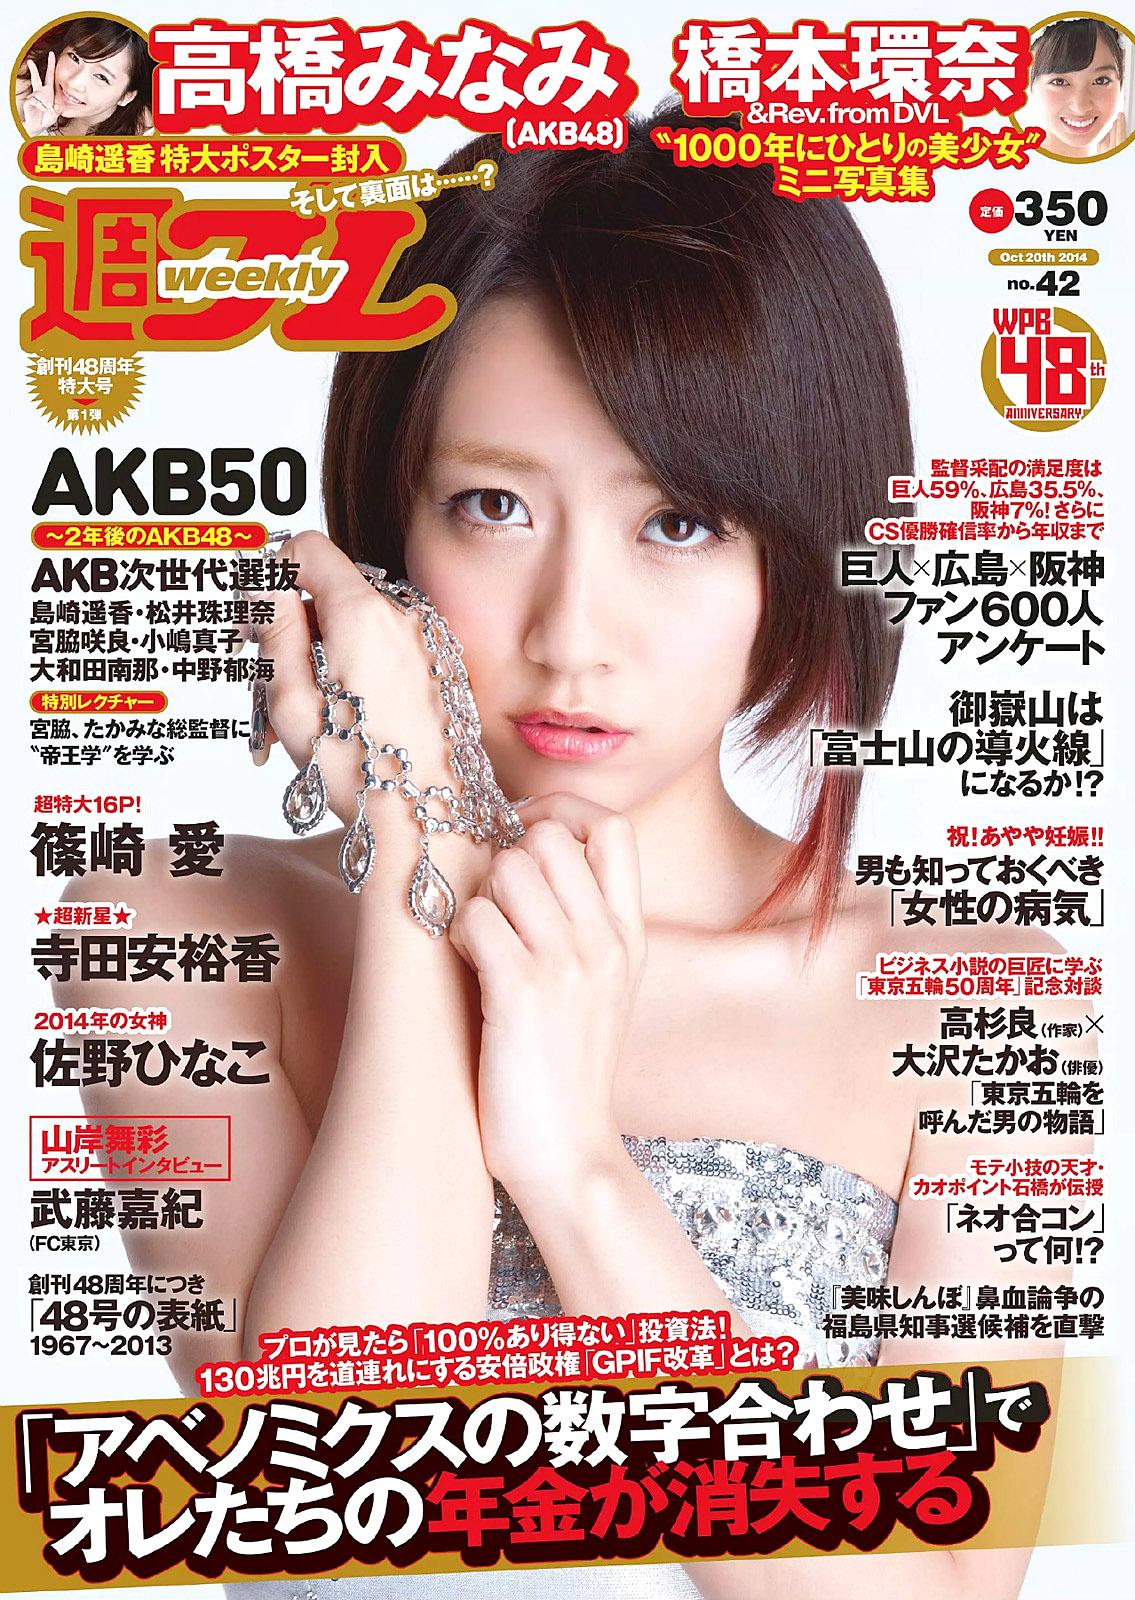 AKB48 WPB 141020 01.jpg